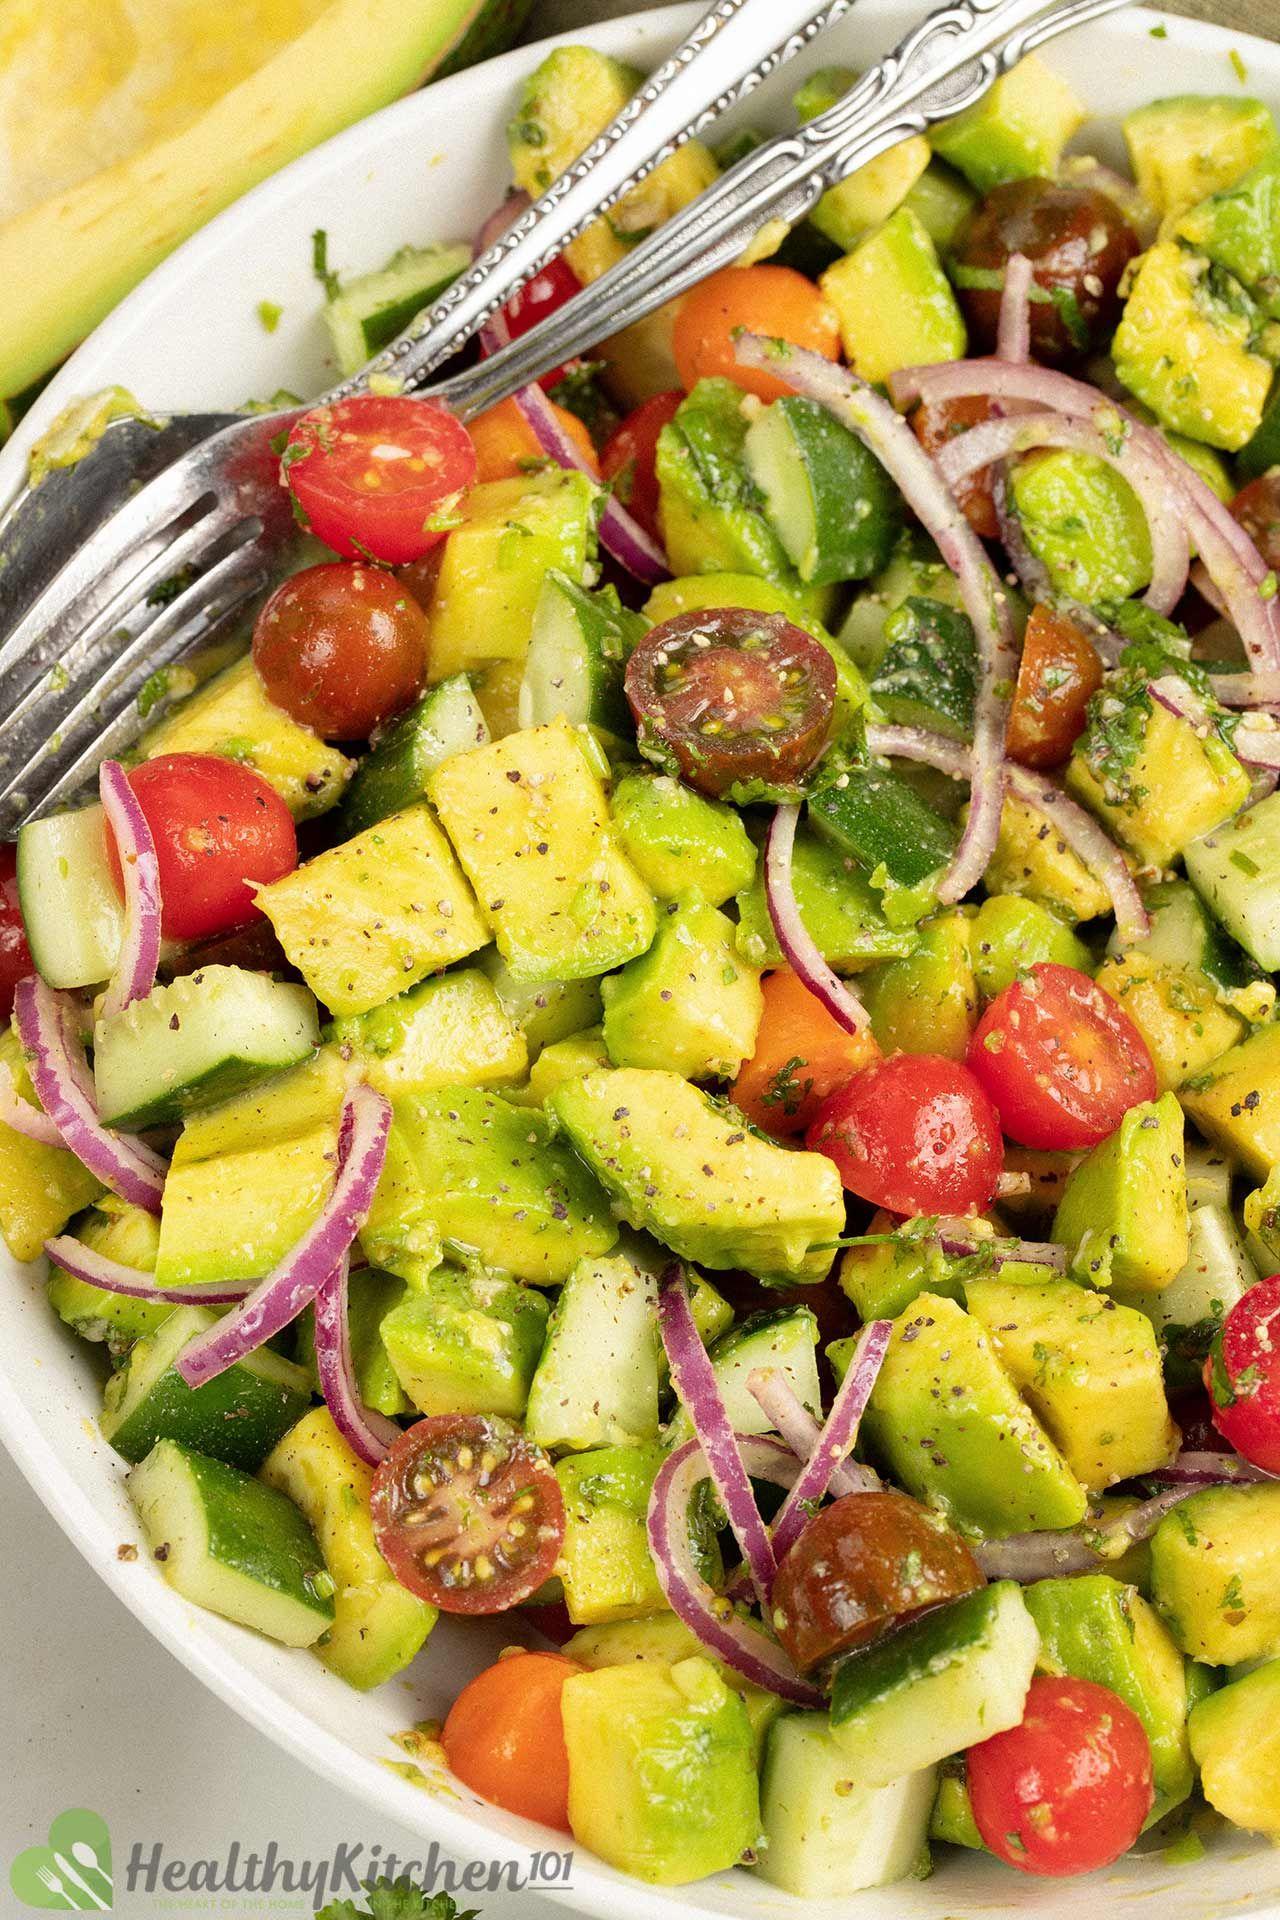 How long does Avocado Salad last